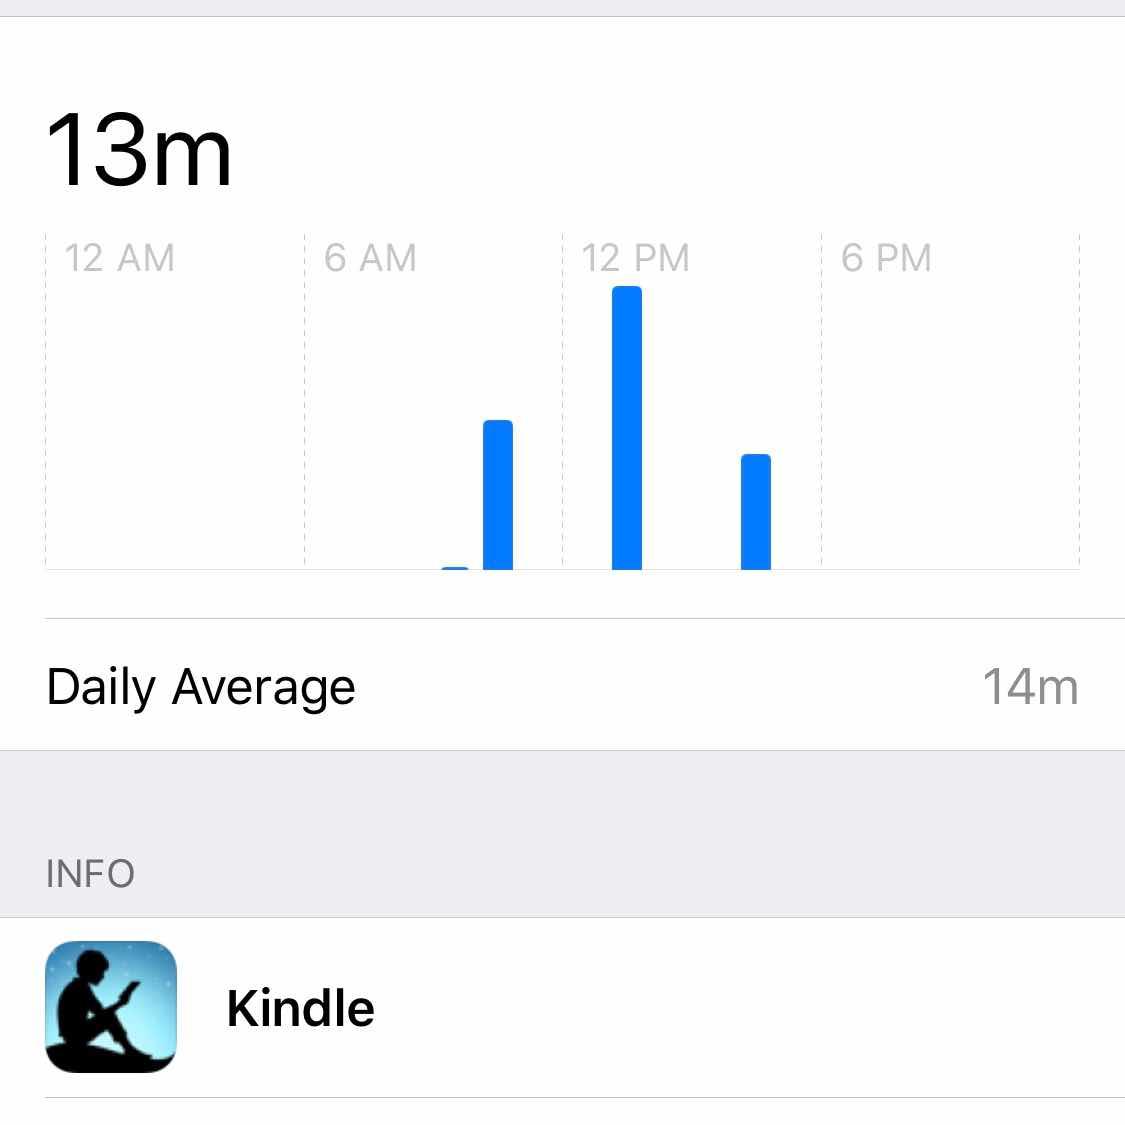 Daily Kindle Usage